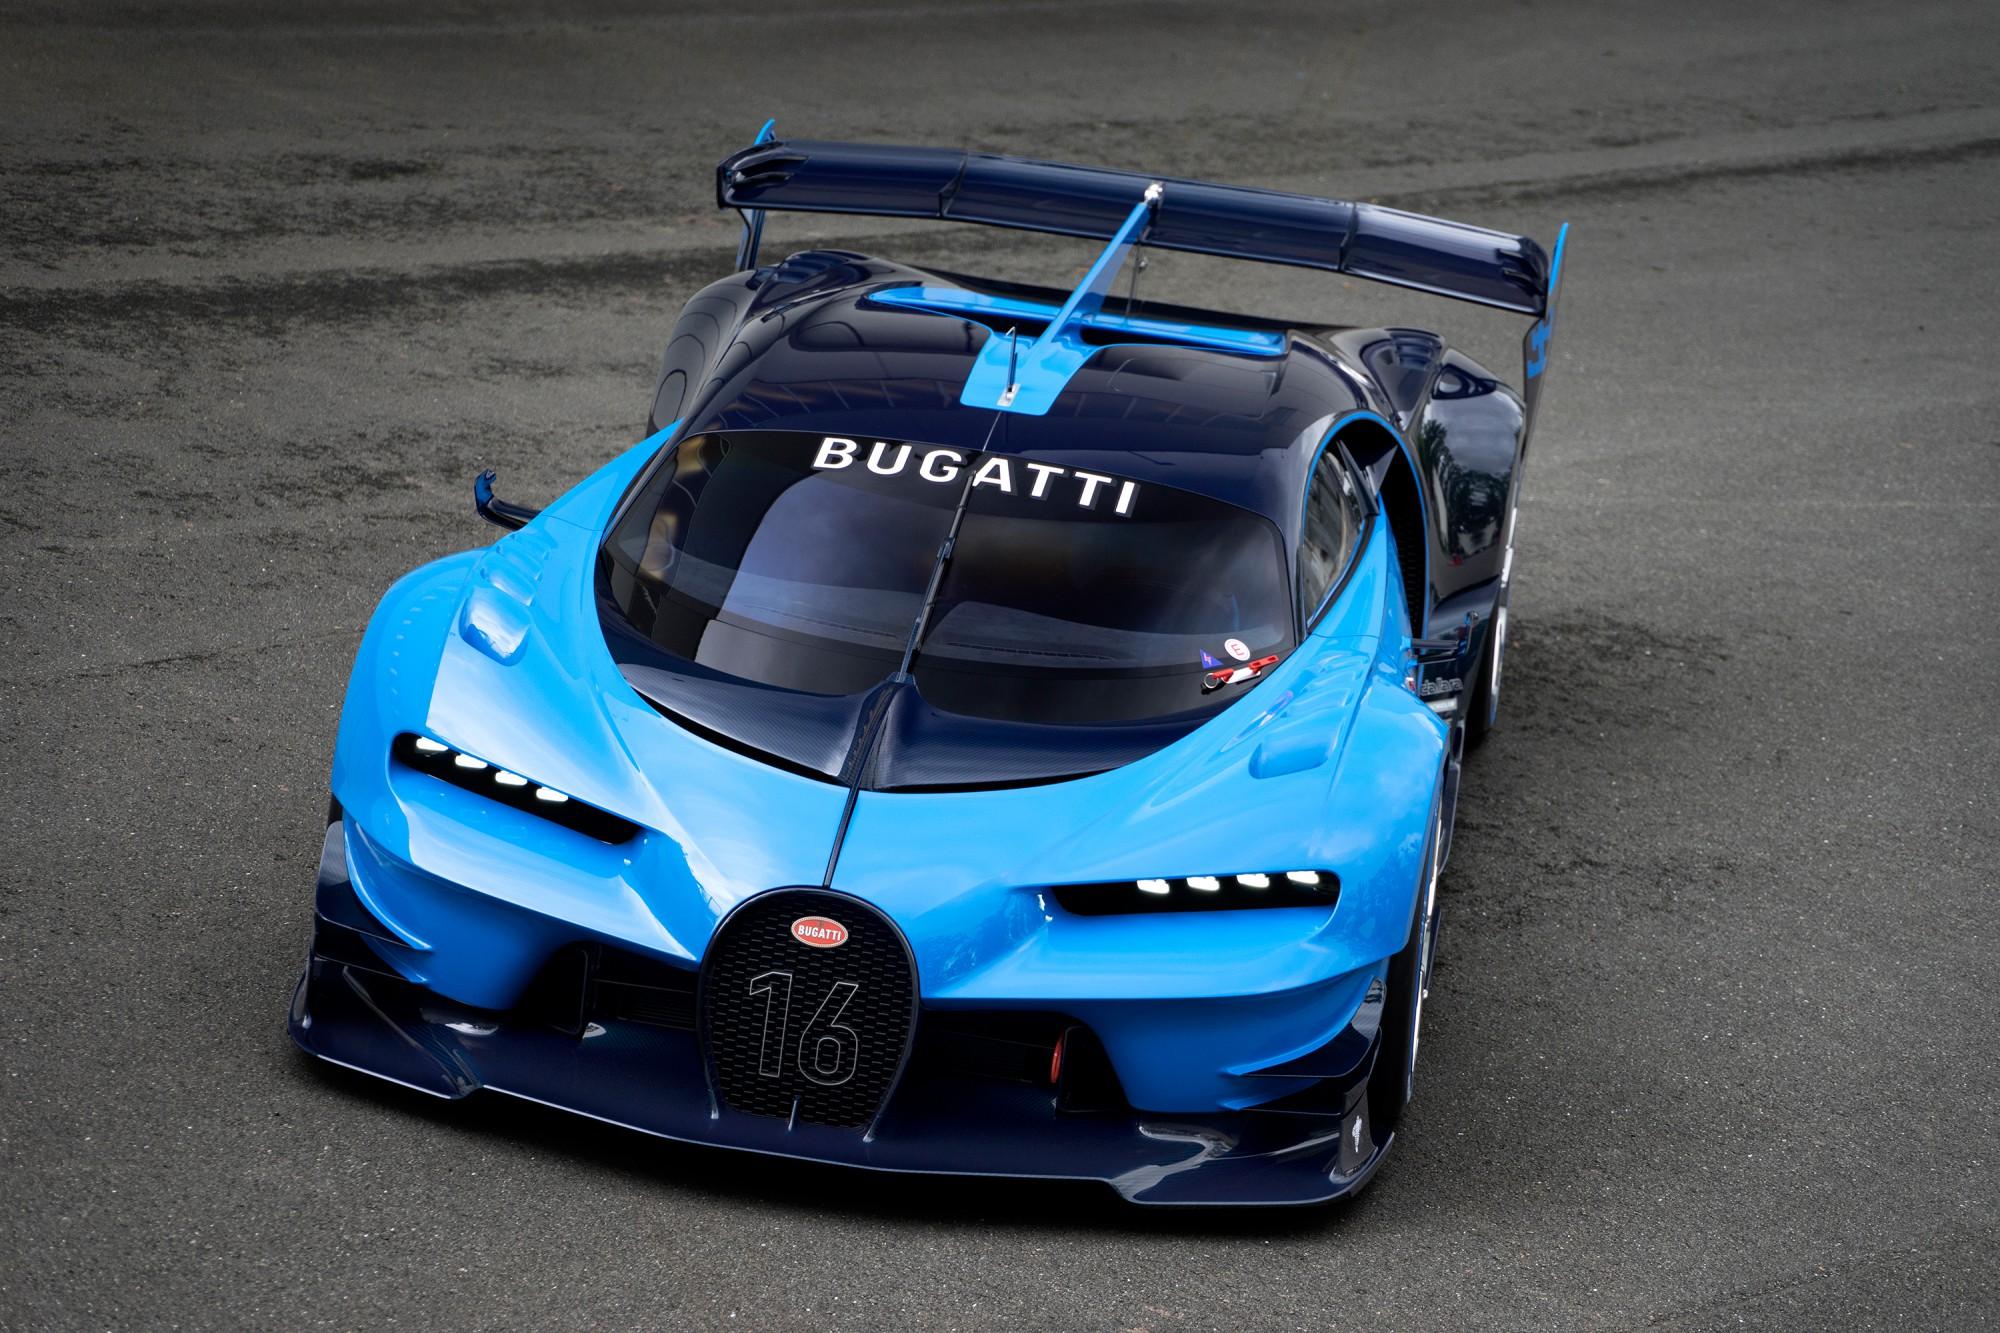 03_Bugatti-VGT_photo_ext_WEB